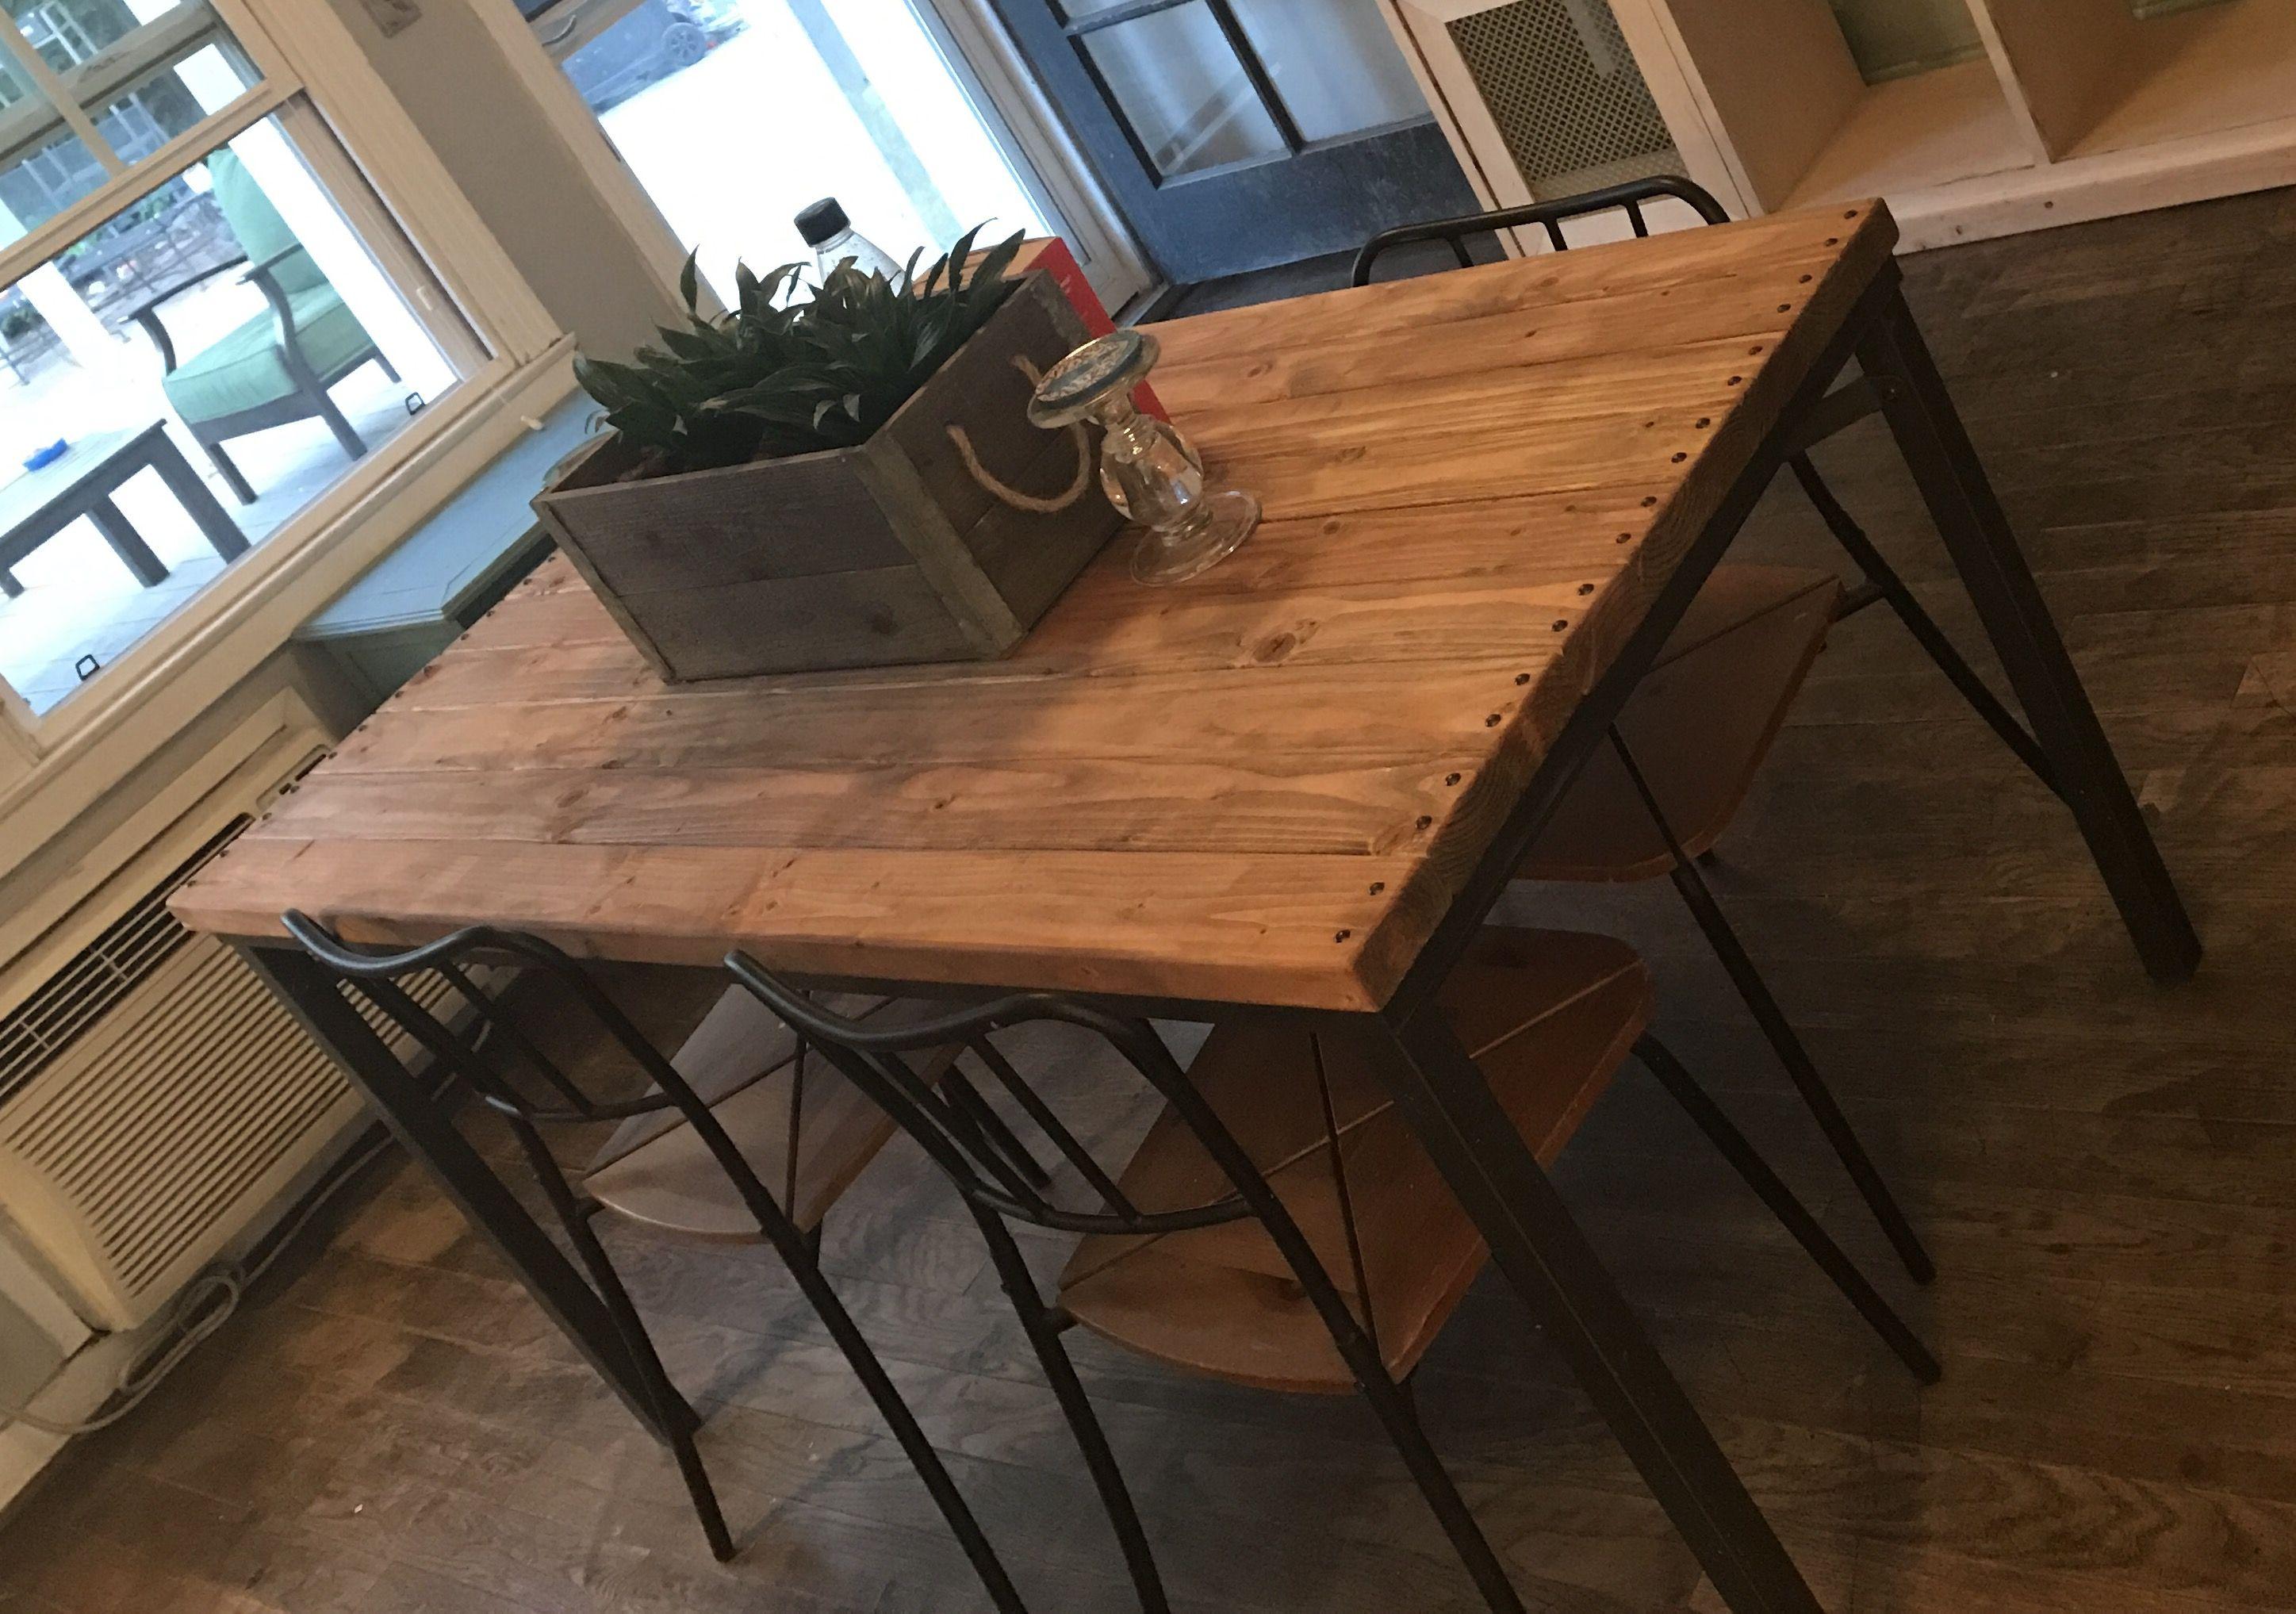 Ikea Granas Table Hack Using 2x4 Boards And Decorative Tacks